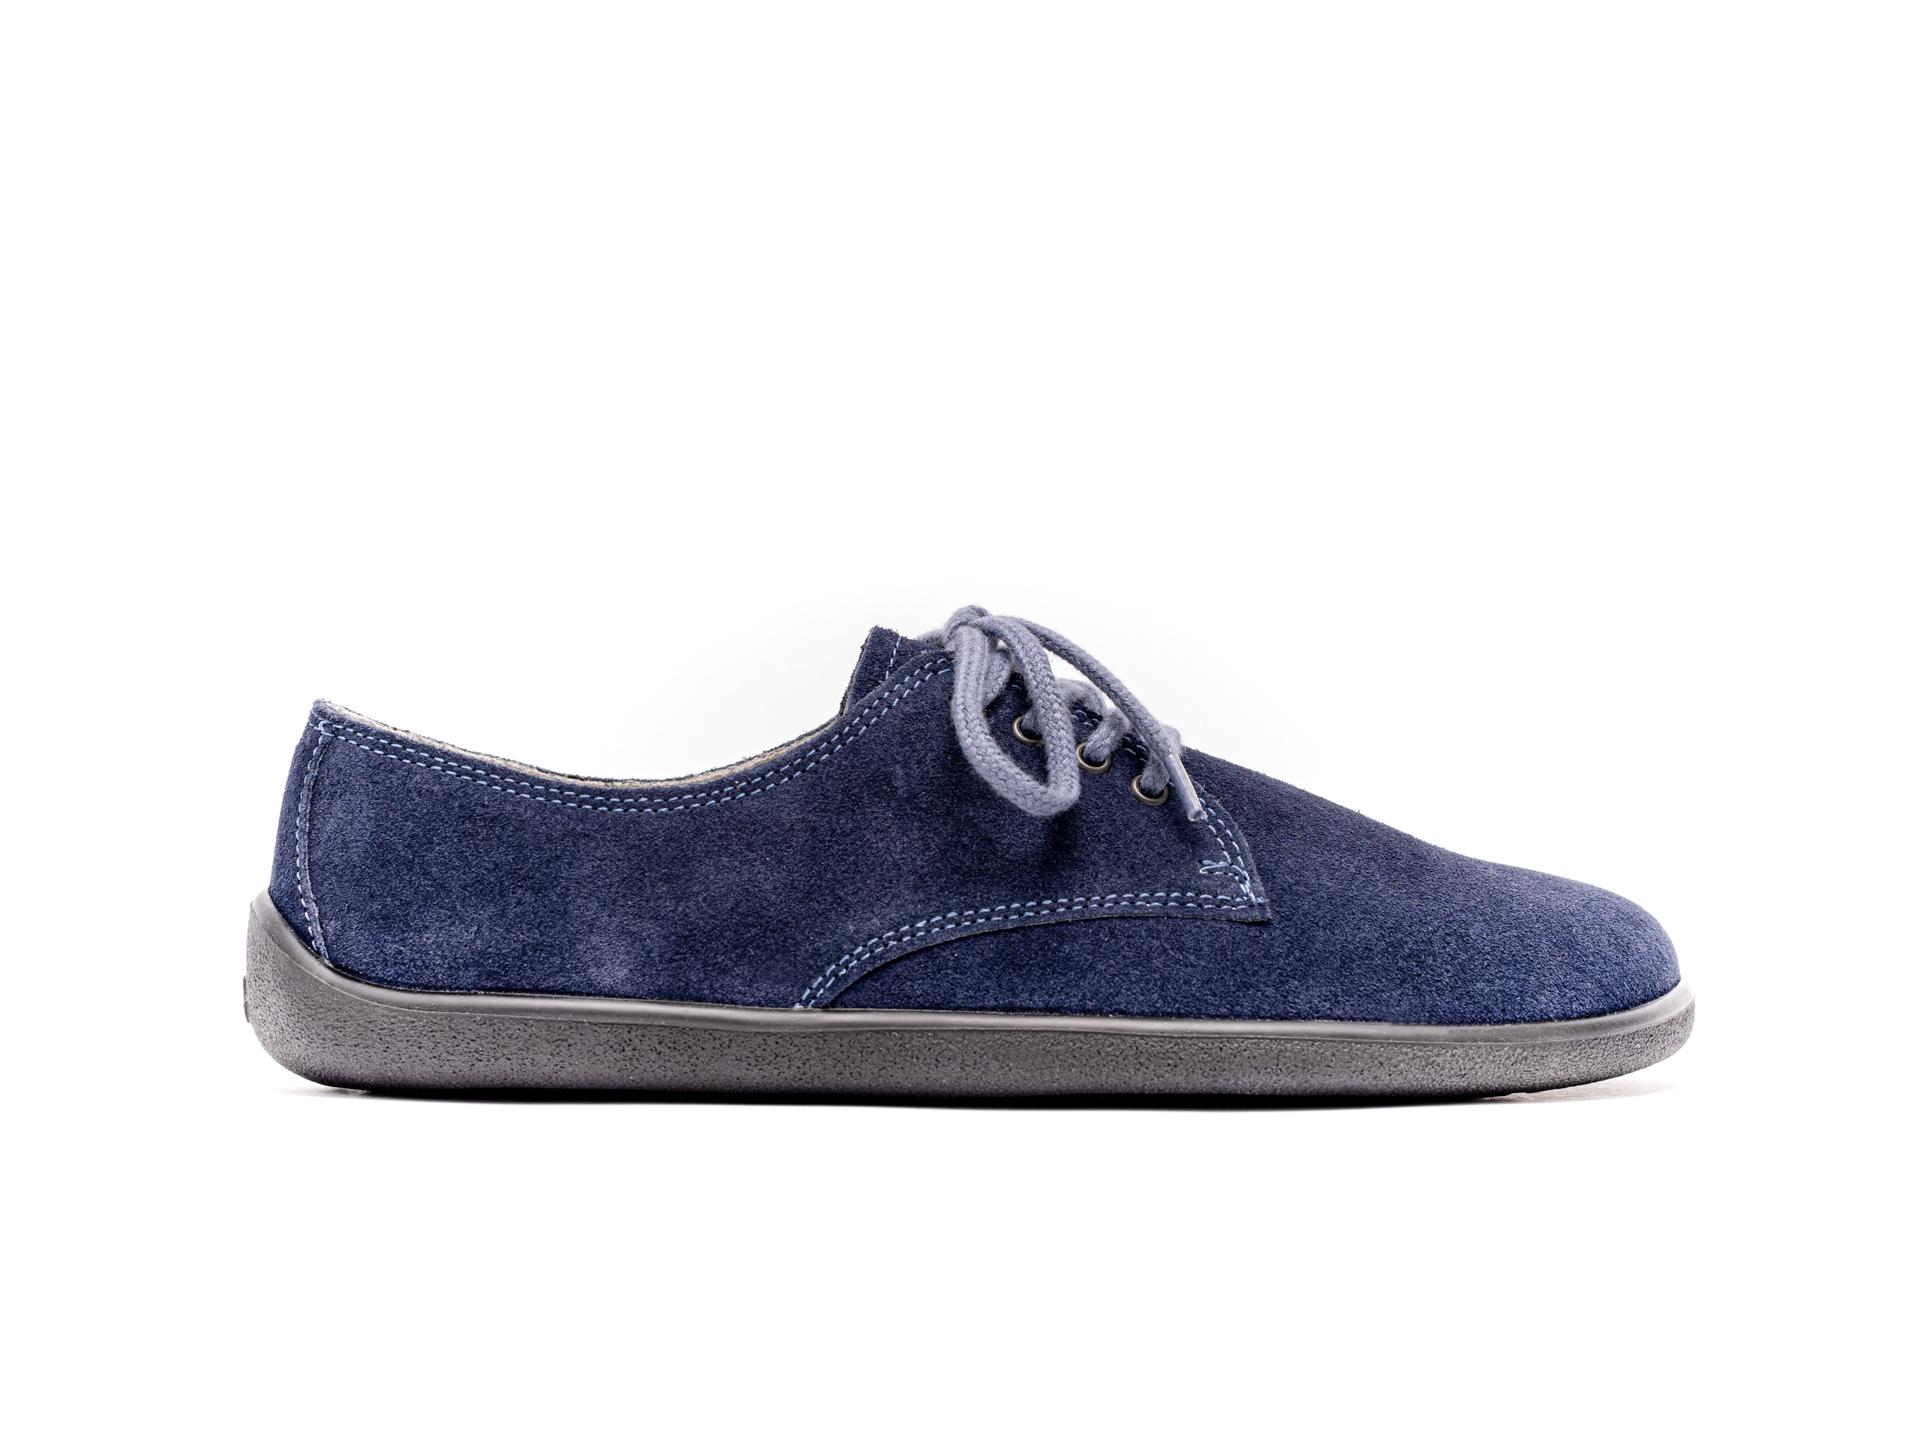 Barefoot Shoes - Be Lenka City - Navy 41